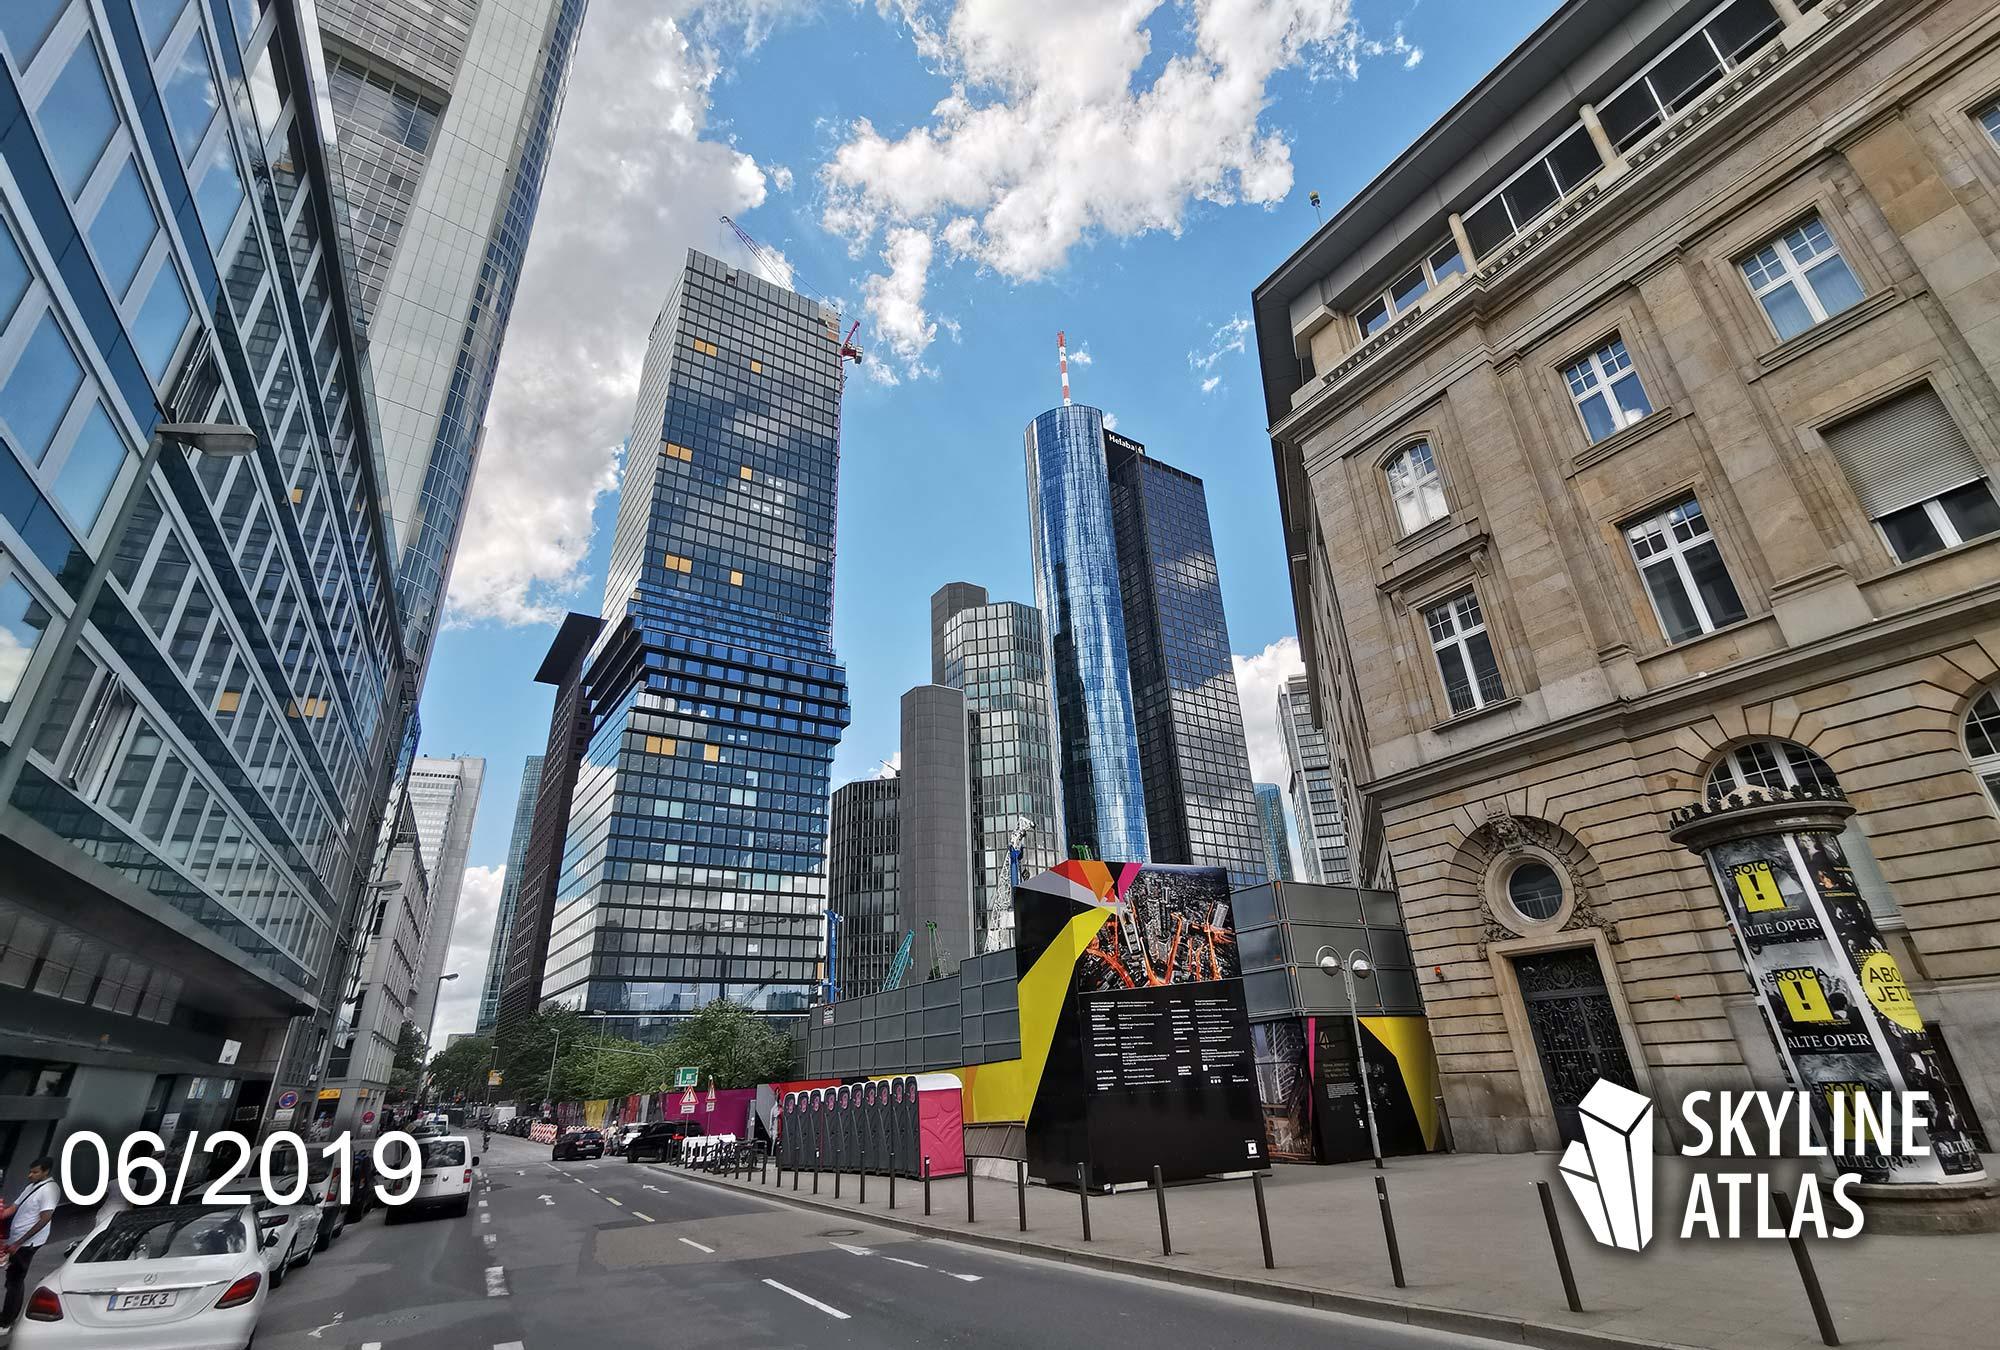 Photo of OmniTurm in Frankfurt - Designed by BIG Bjarke Ingels - Skyscraper containing apartments for sale